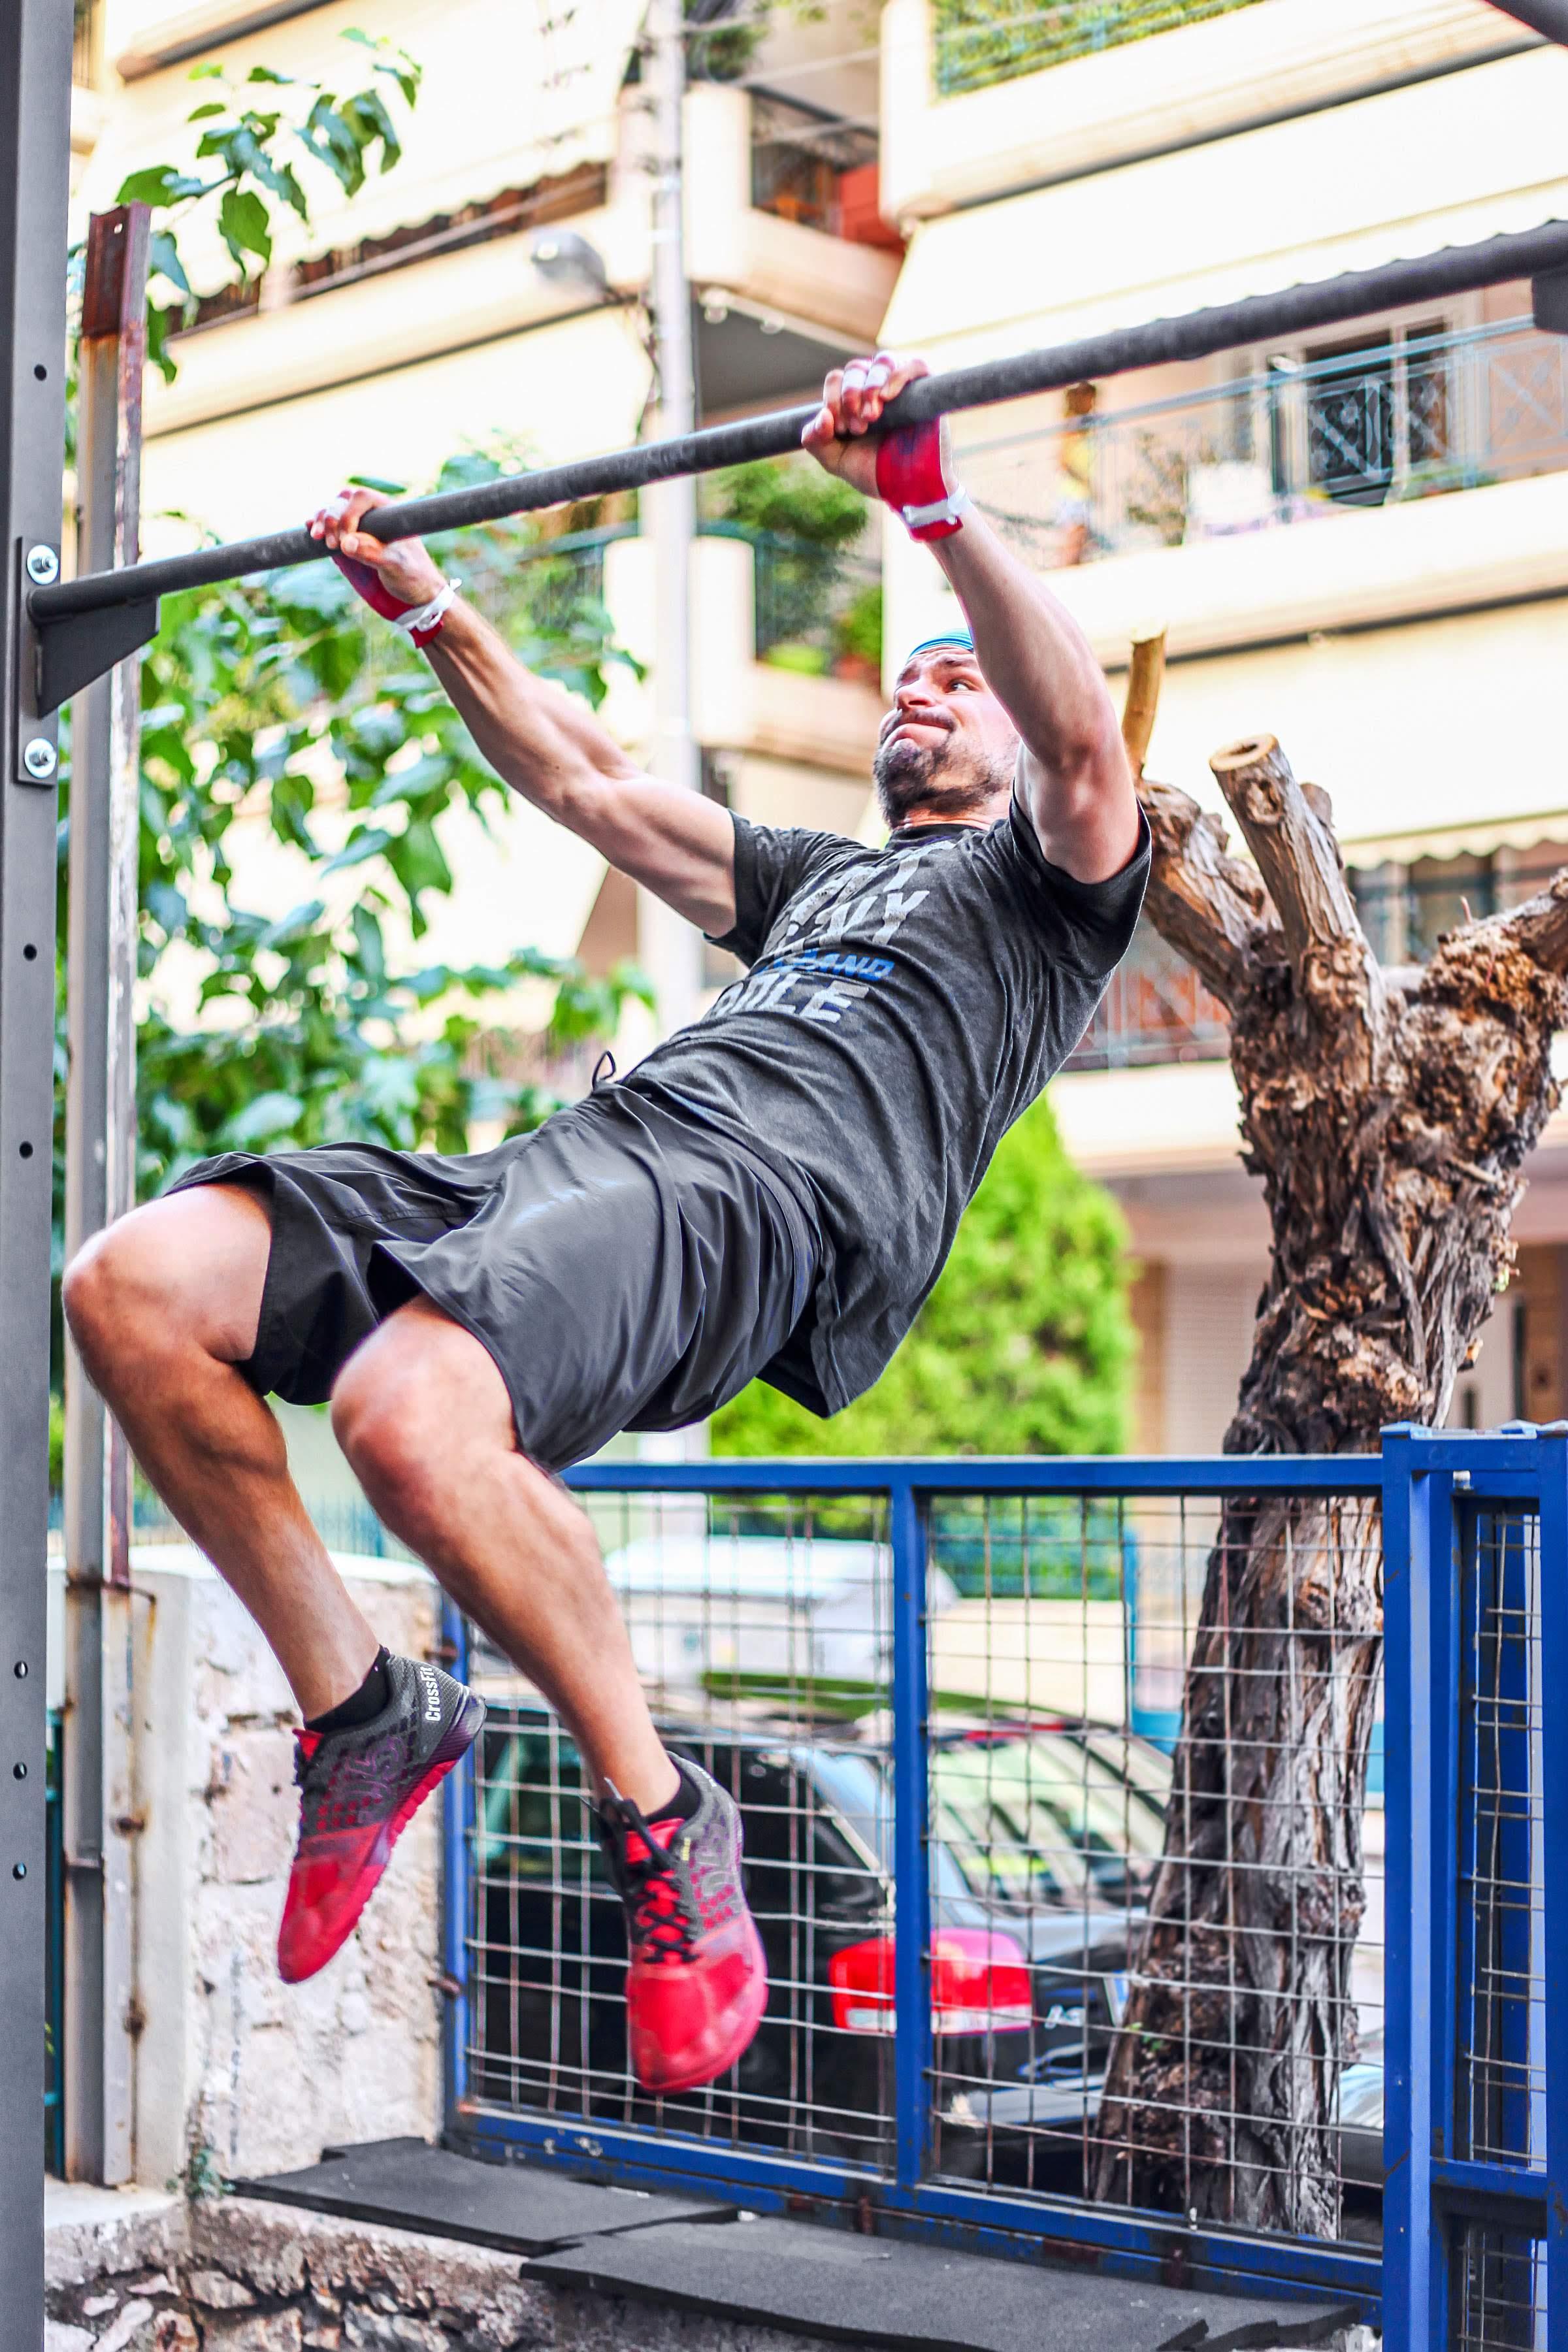 Tony Beringer mid-bar muscle-up at CrossFit Piraeus in Greece.